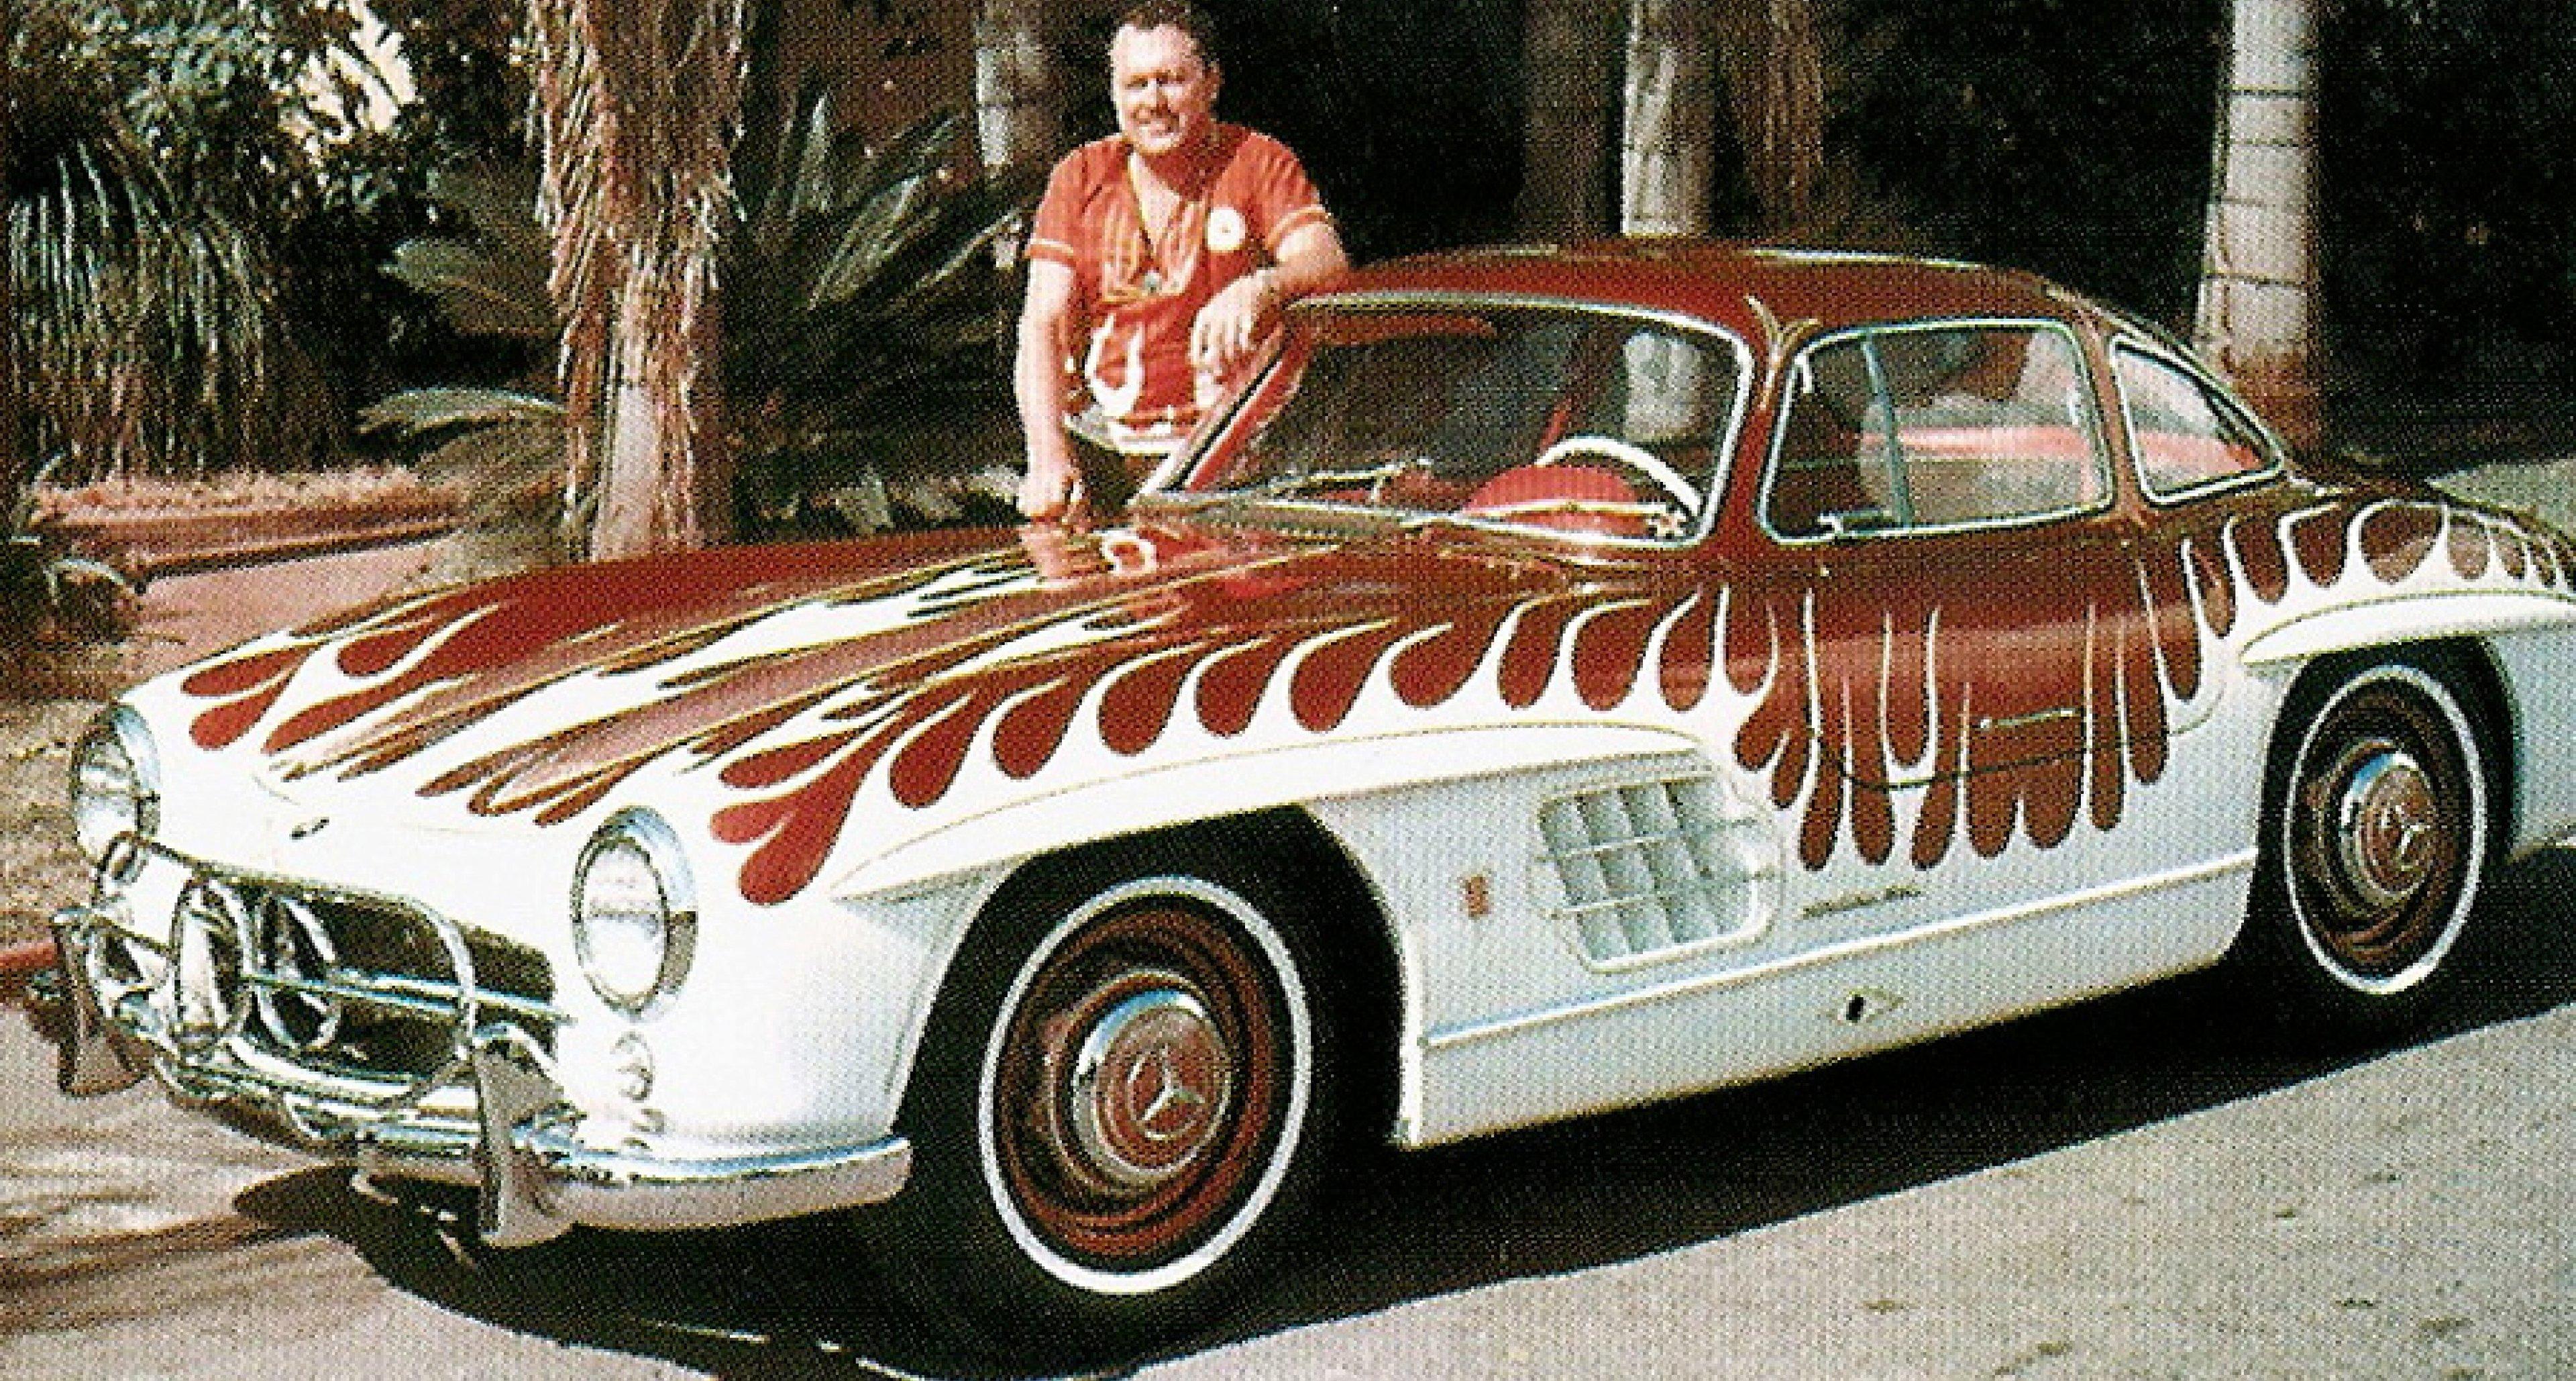 Von Dutch and the 'flamed' Mercedes 300 SL